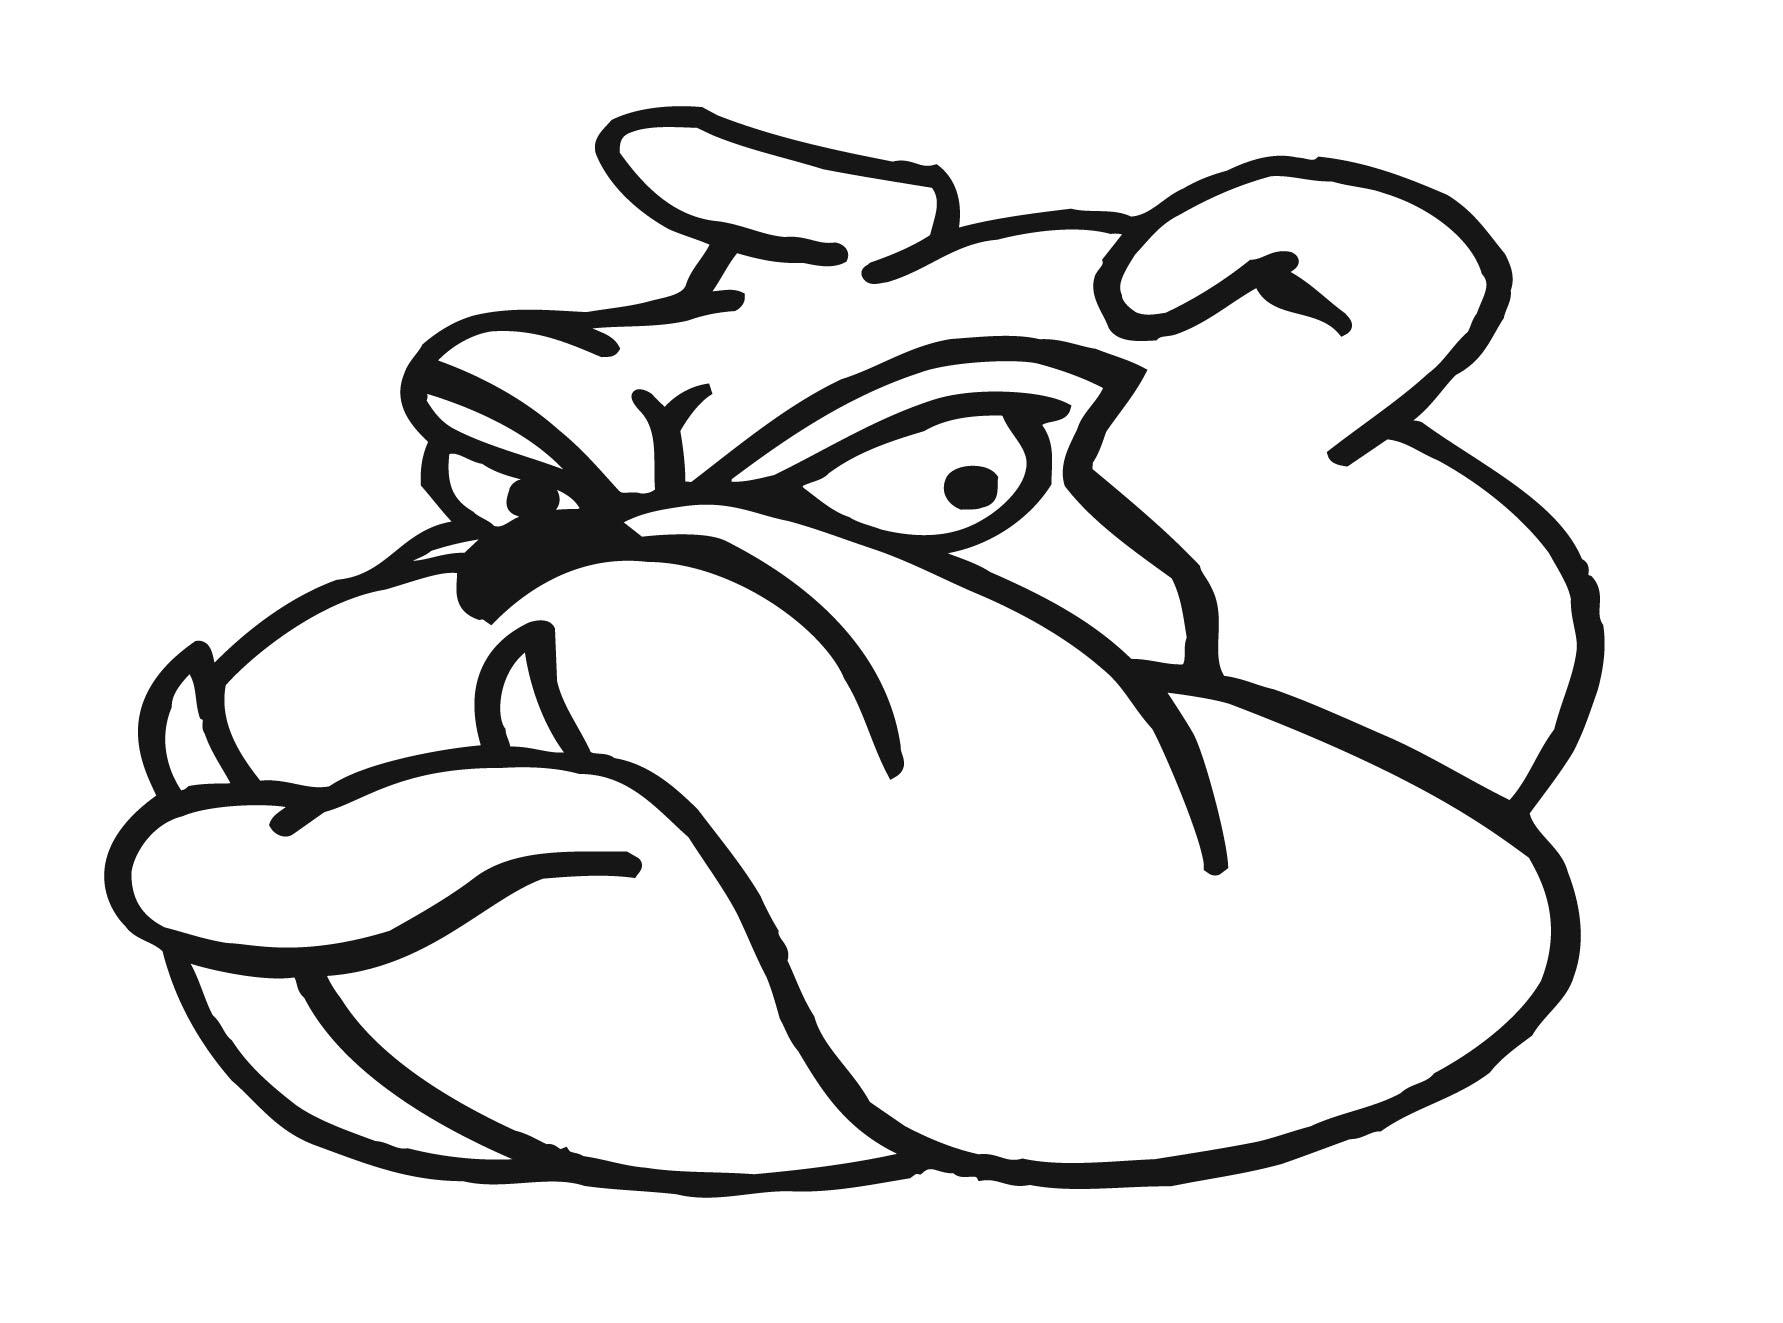 Bulldog Outline Clipart